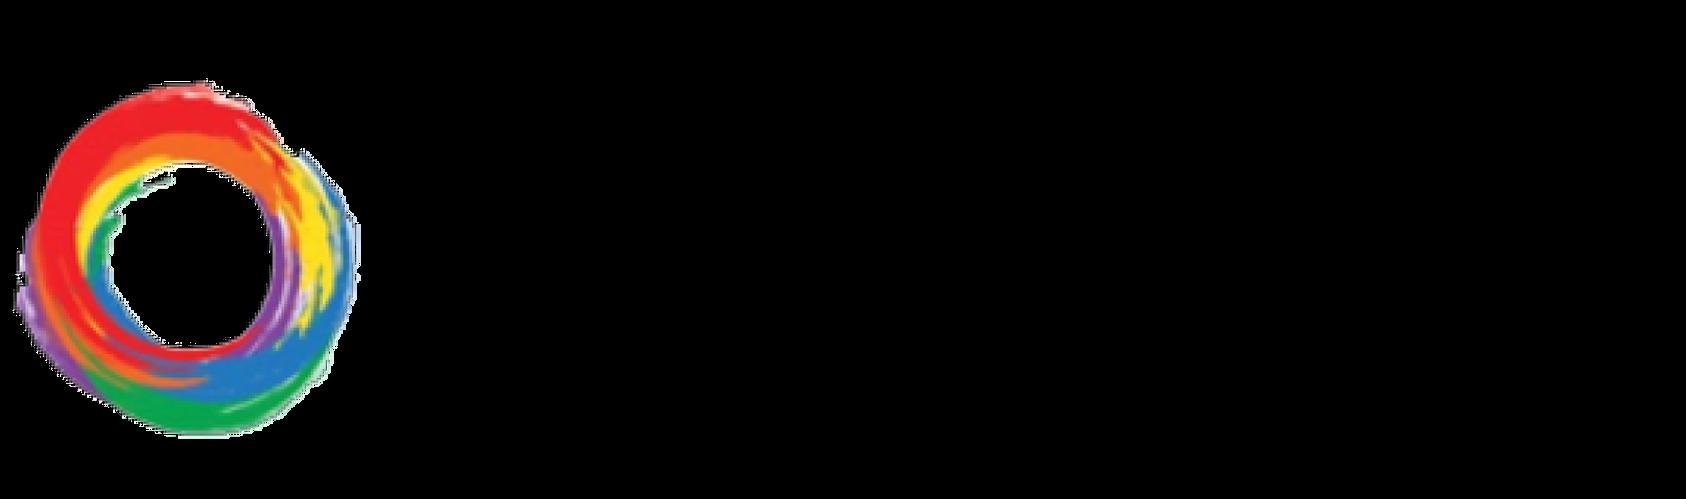 One_N_10-logo2.png